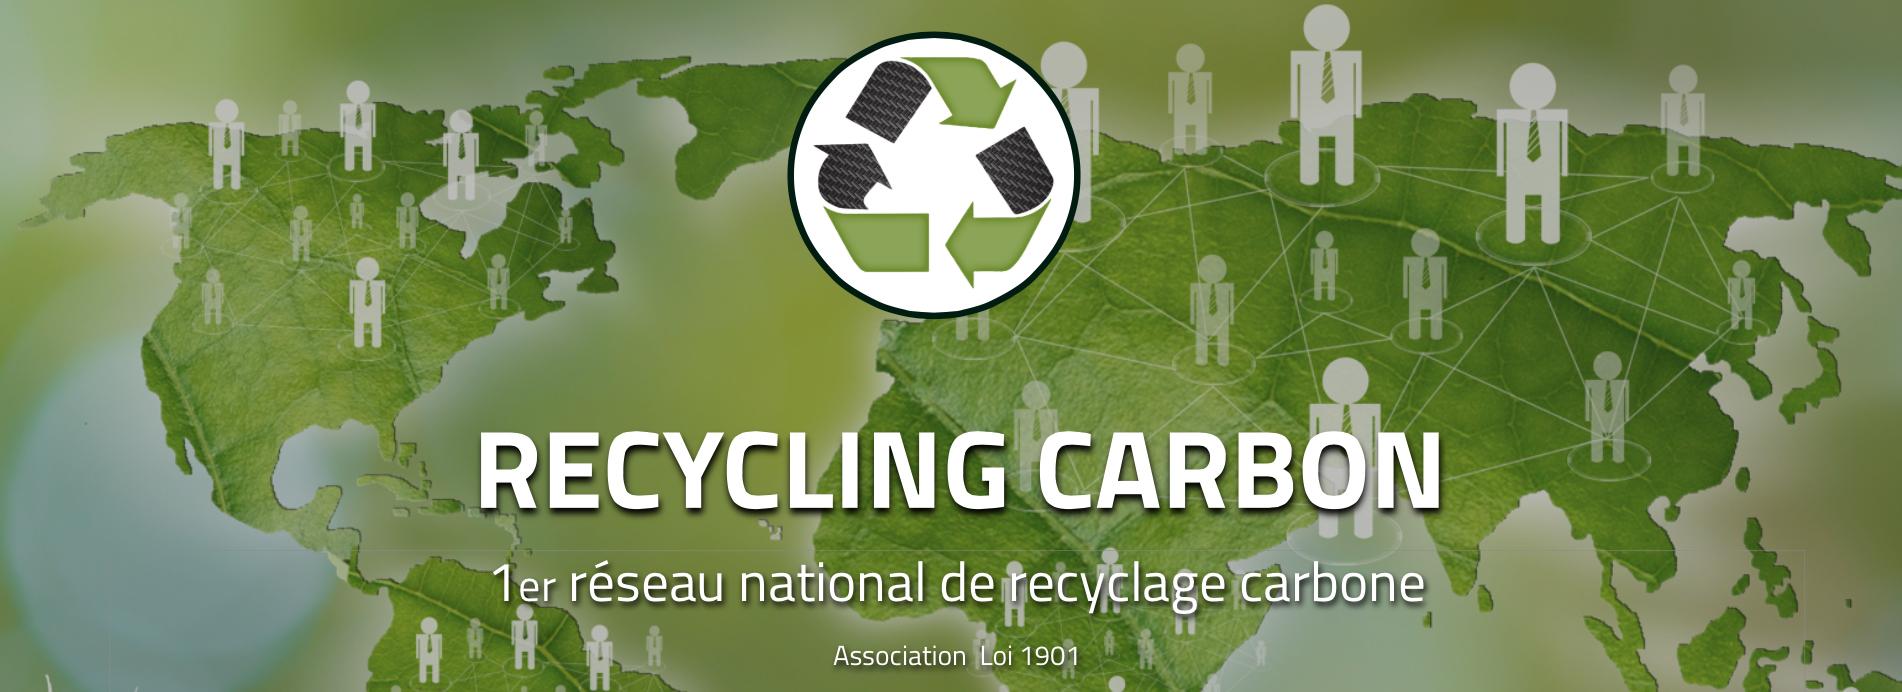 Association recycling carbon